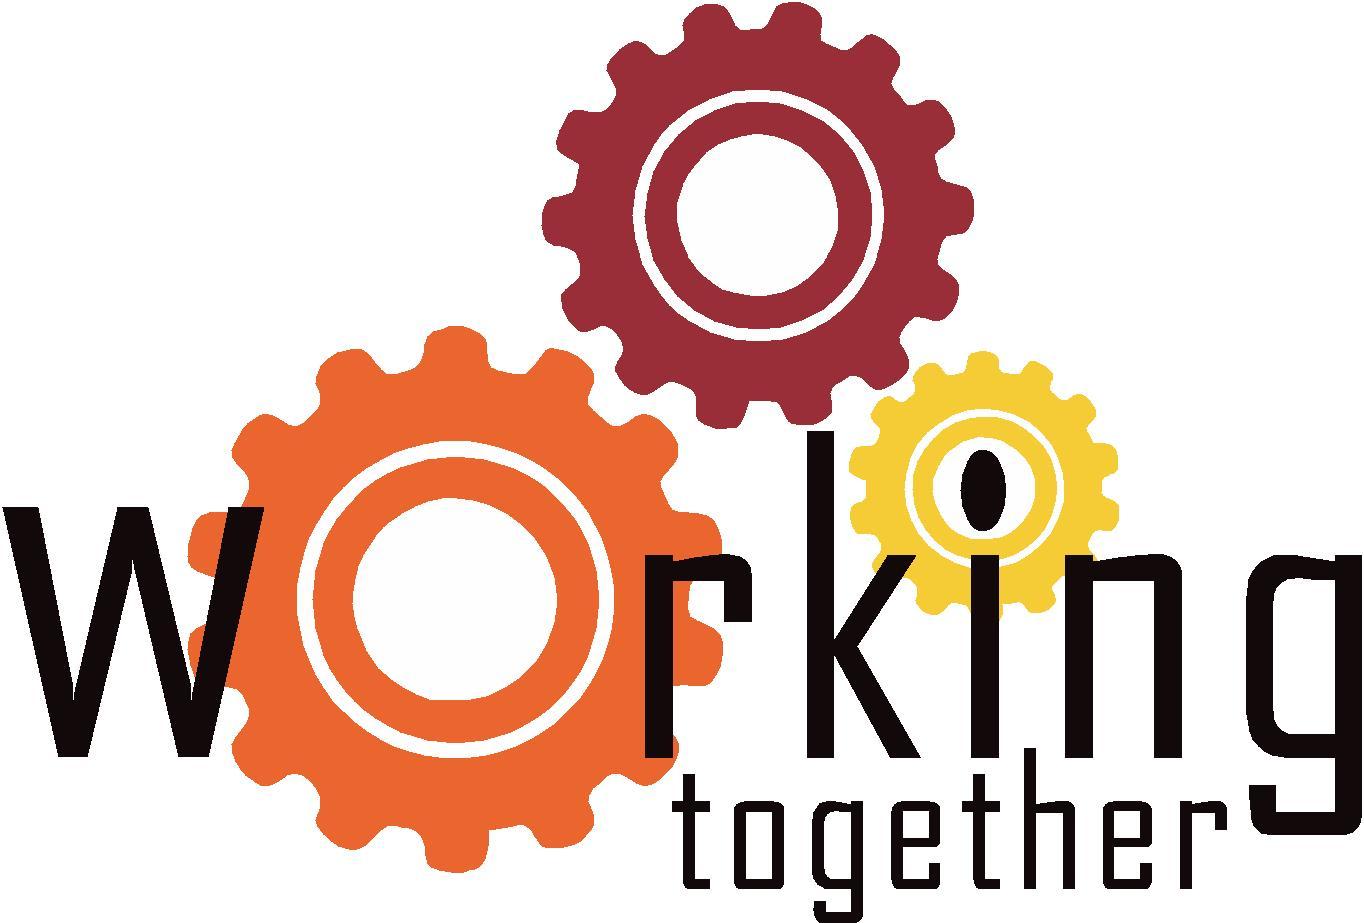 https://improvingpolice.files.wordpress.com/2015/01/working-together.jpg